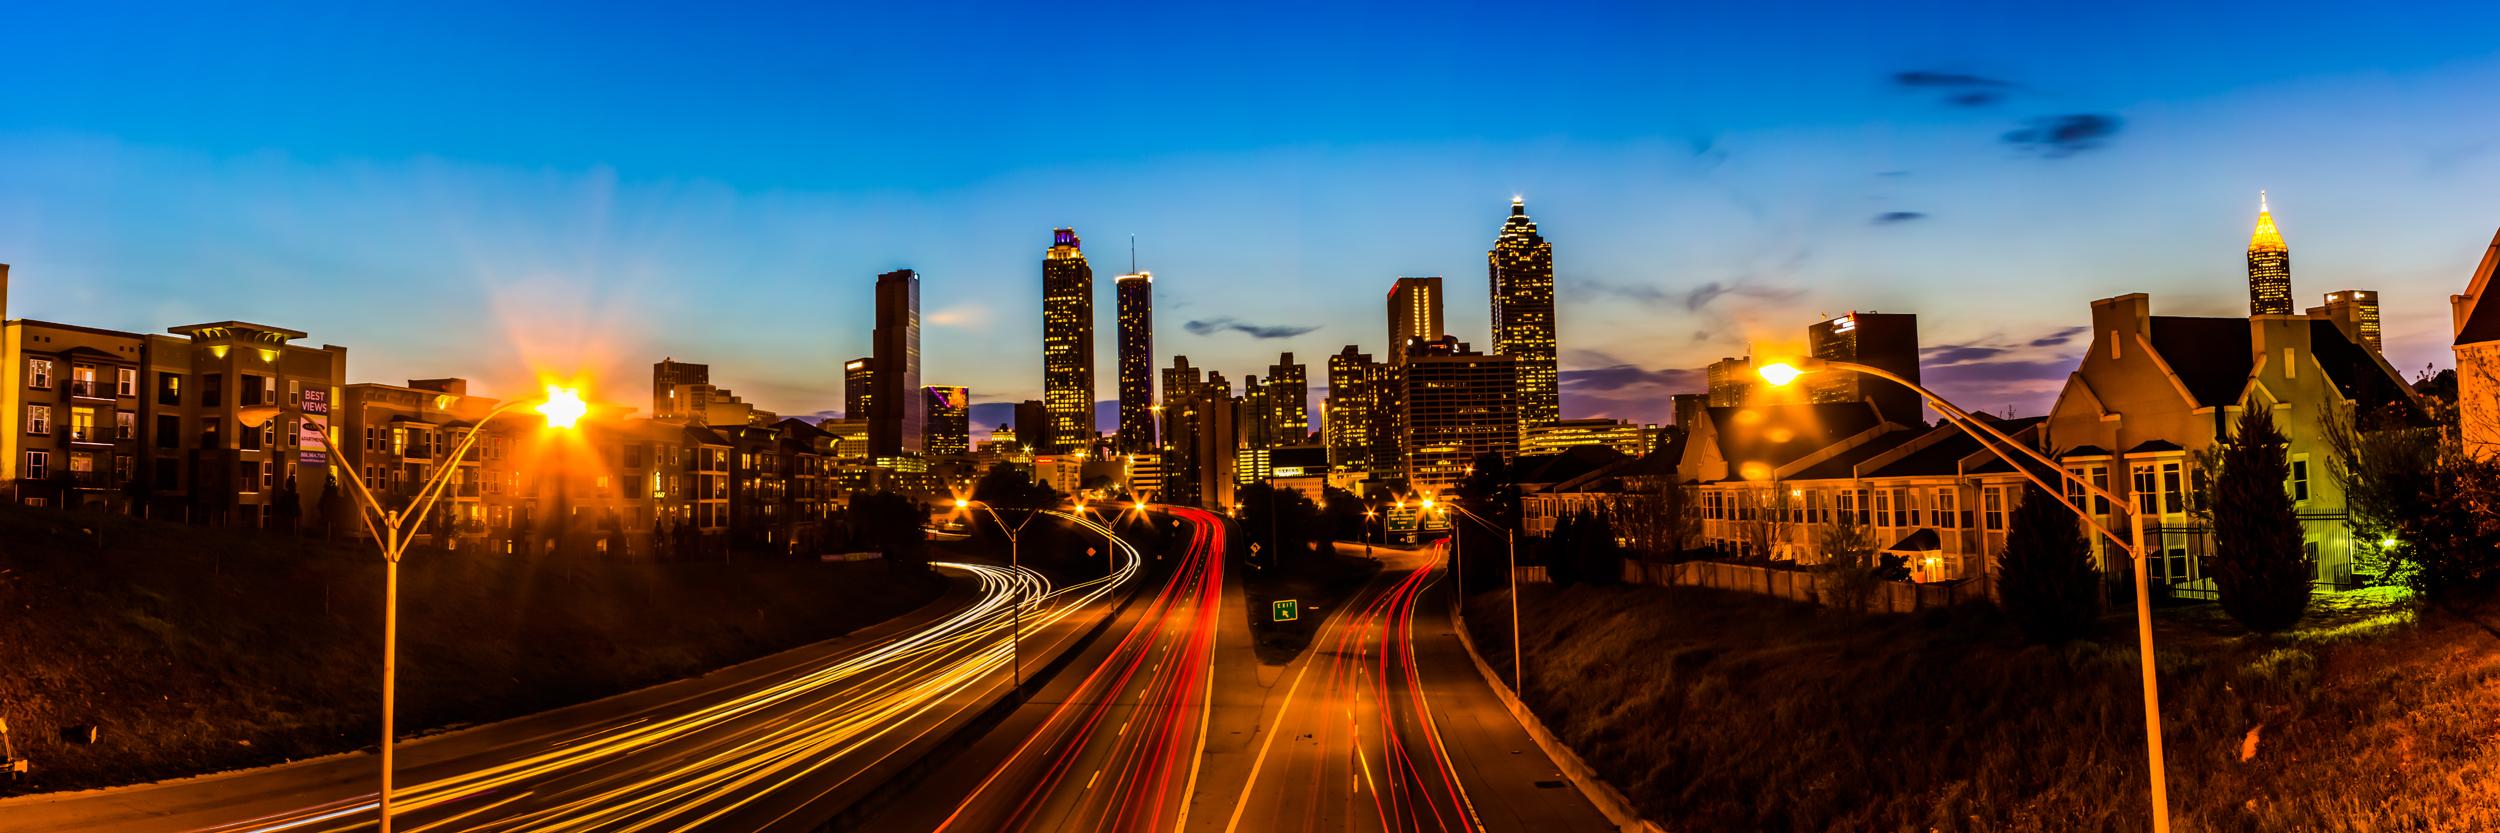 Atlanta Skyline from the Jackson Street Bridge at Sunset